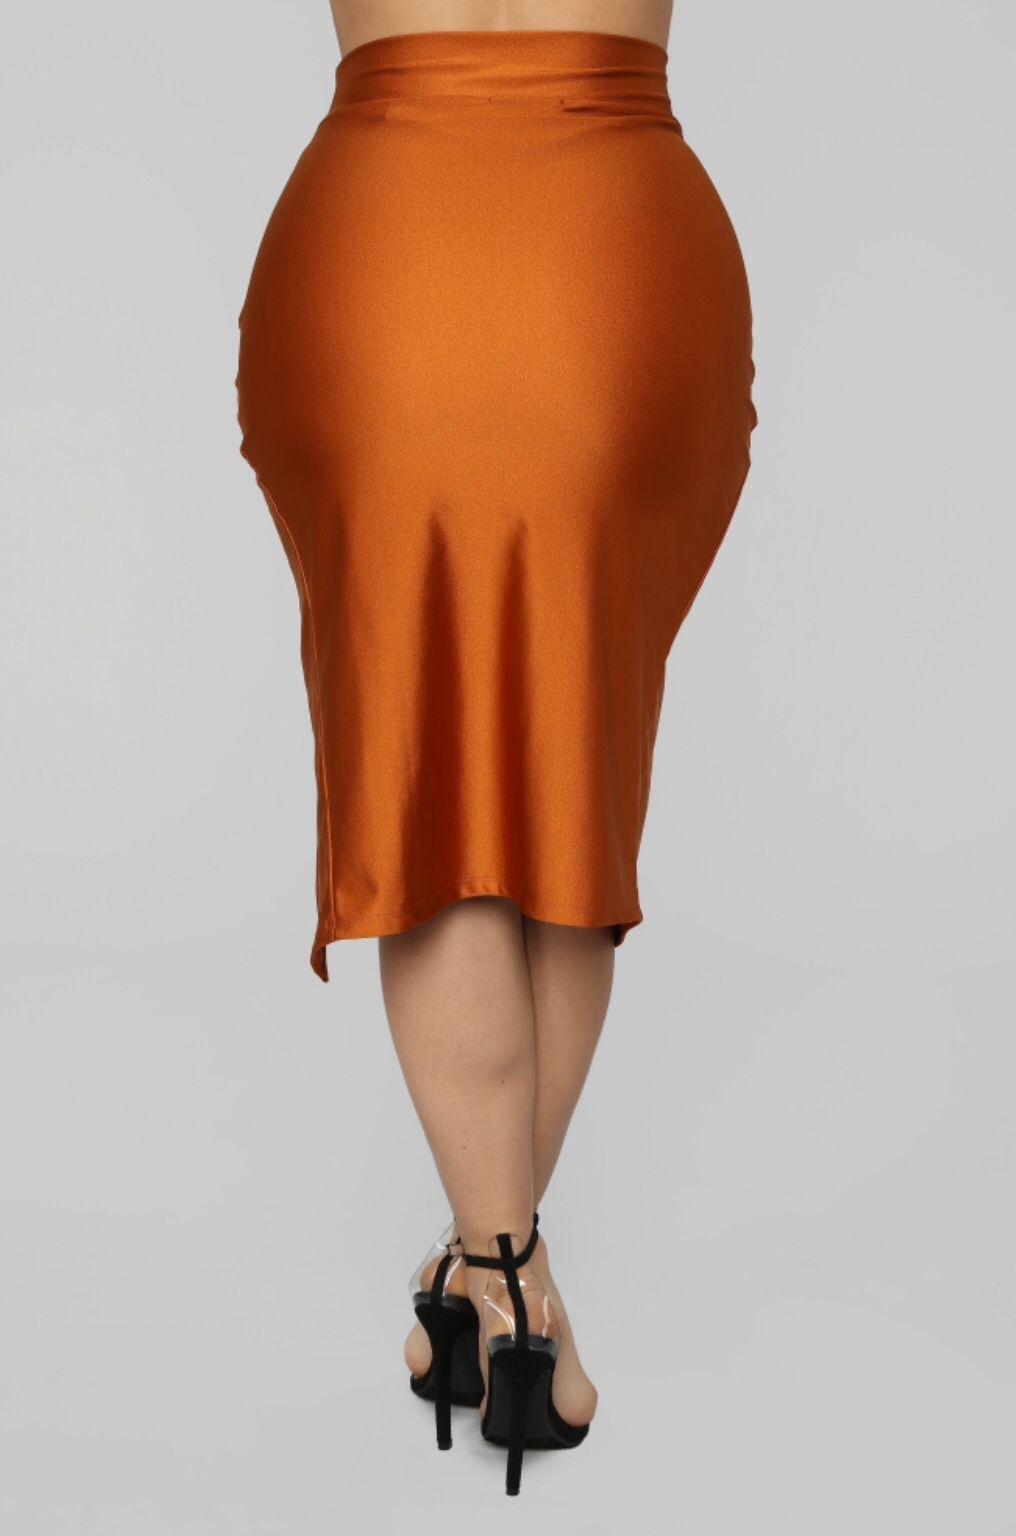 7031434d1 Janet Guzman, Midi Skirt, High Waisted Skirt, Curves, High Waist Skirt,